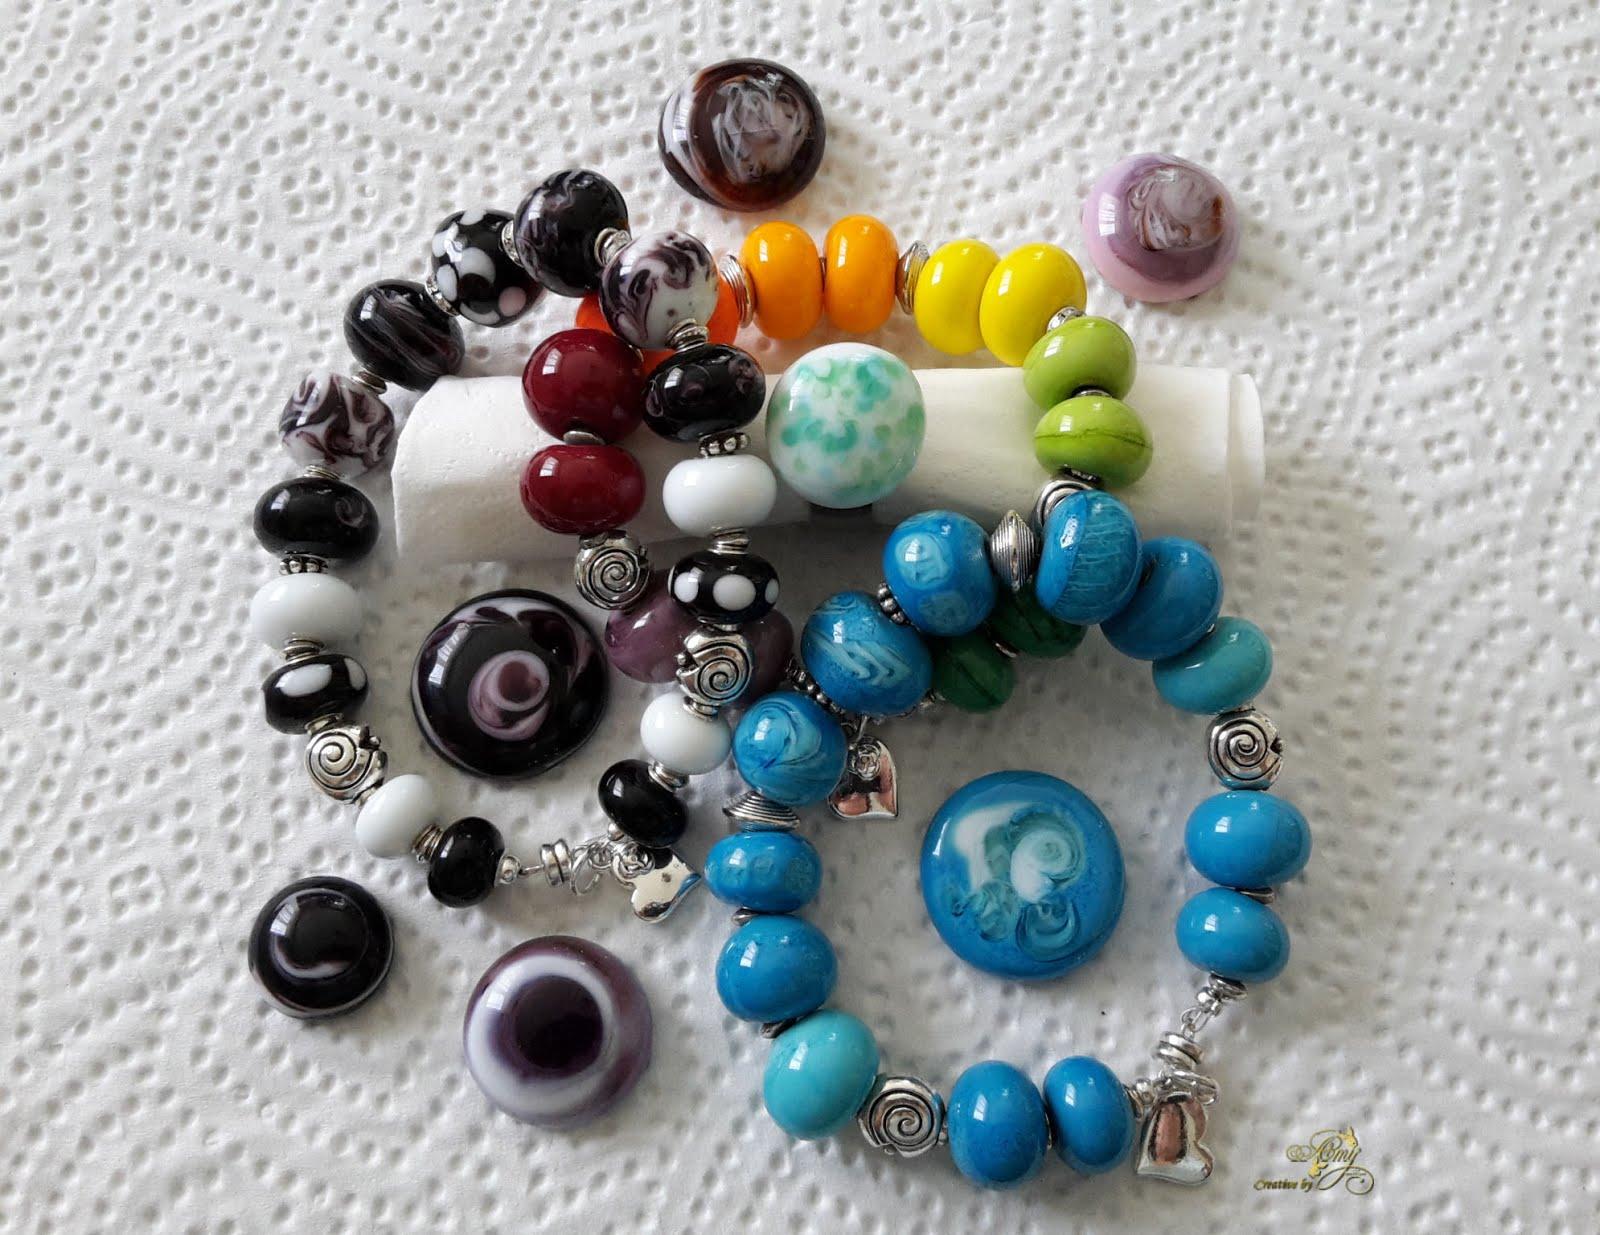 Perlen Style by Romy meine ersten Perlen